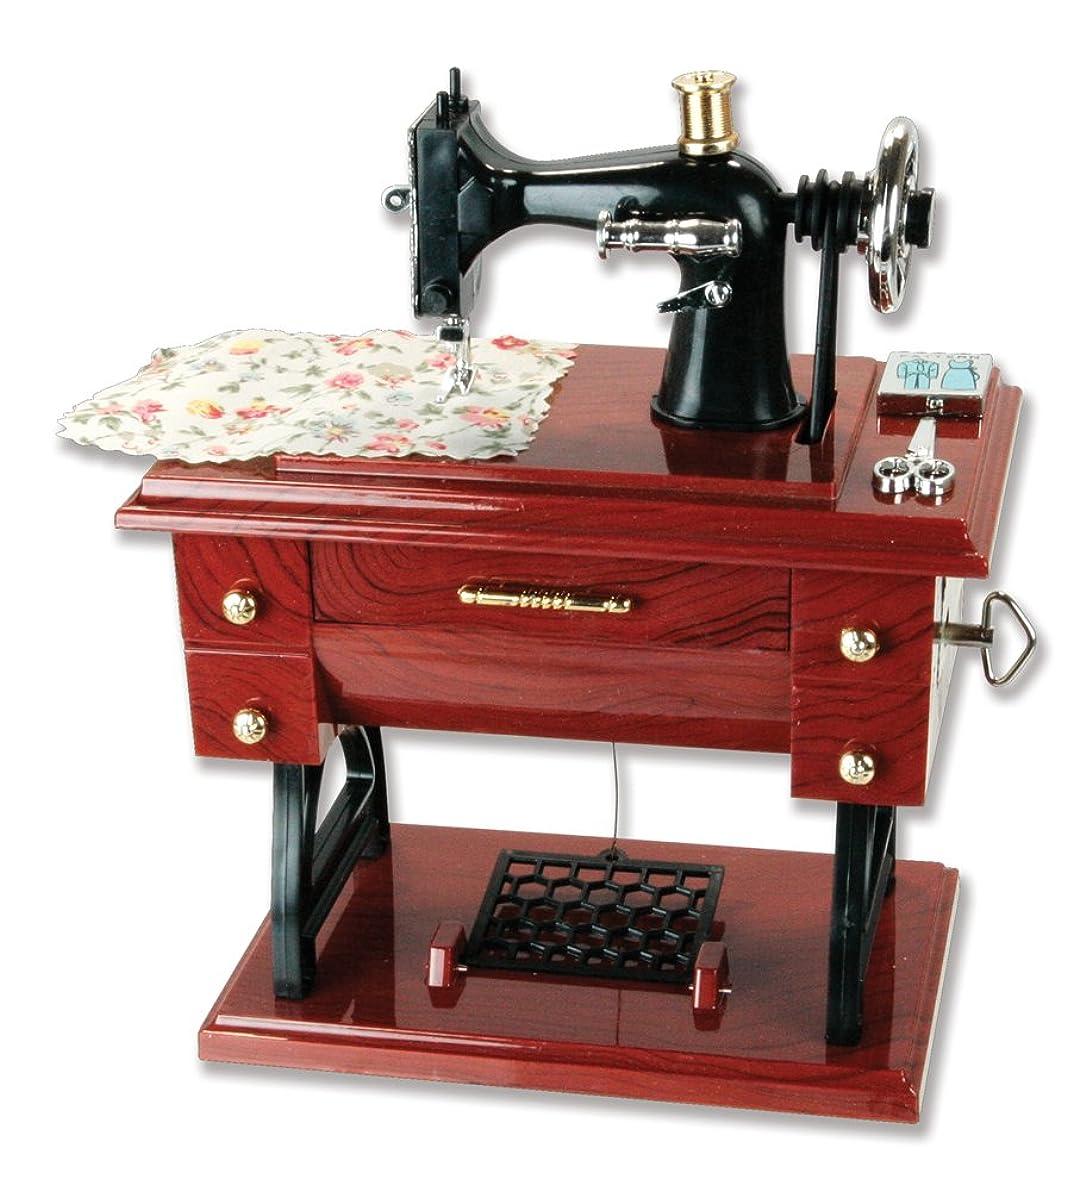 Patty Both Musical Sewing Machine Music Box Vintage Look (Brown-1)